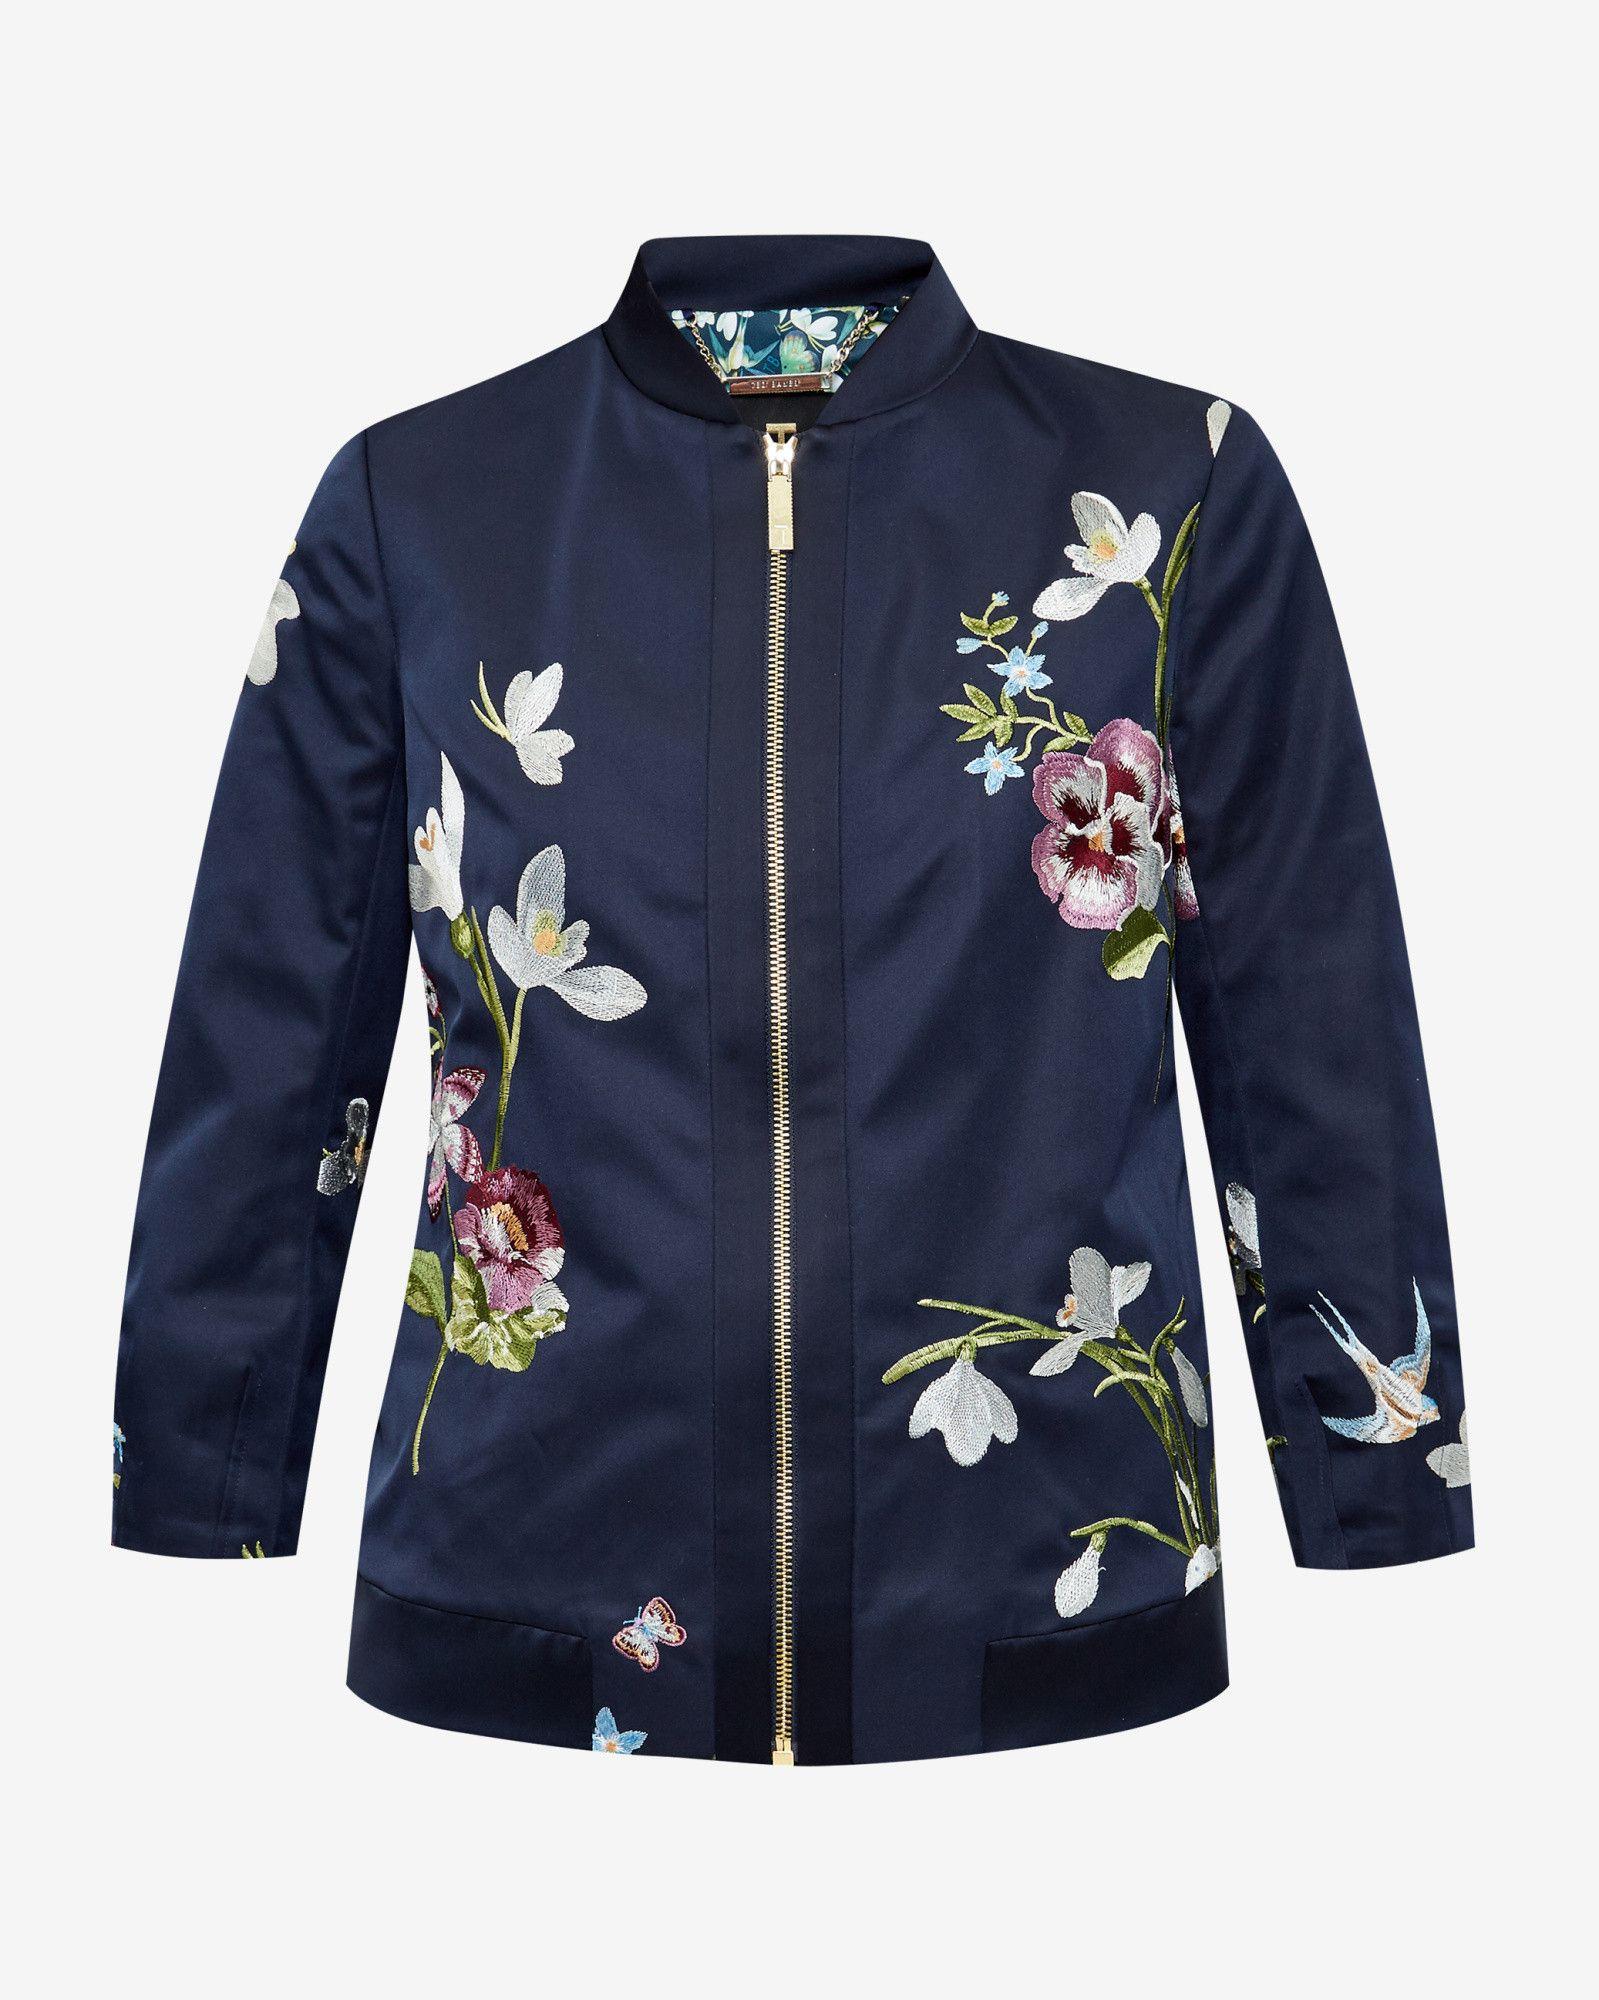 Spring Meadow Embroidered Bomber Jacket Dark Blue Jackets Amp Coats Ted Baker Uk Patterned Bomber Jacket Floral Bomber Jacket Casual Shirt Women [ 2000 x 1599 Pixel ]